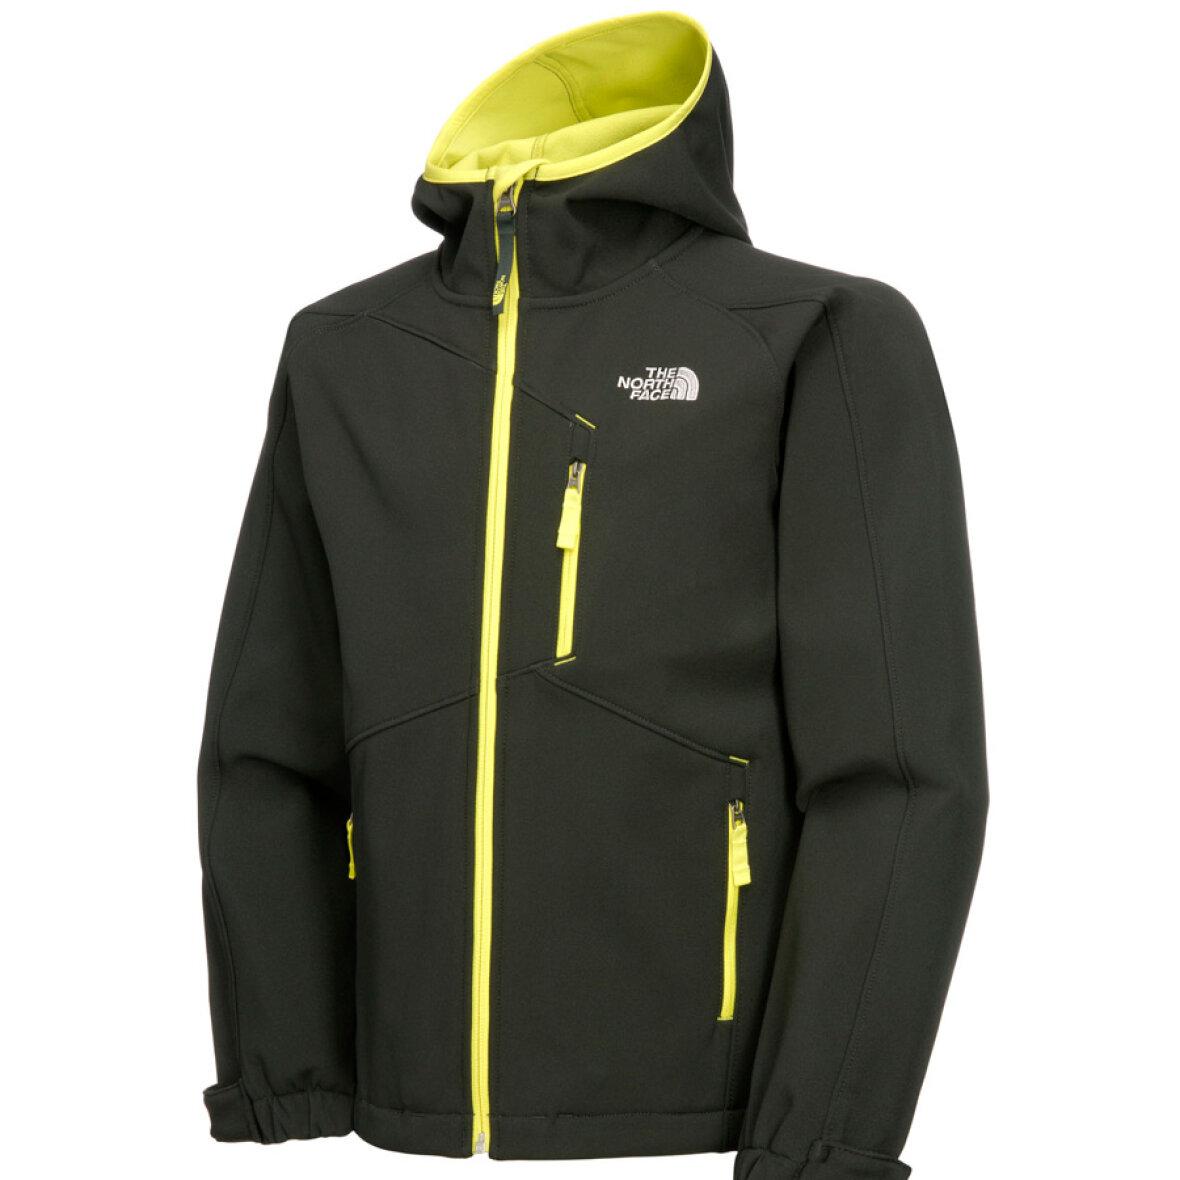 The North Face billige softshell jakker, The North Face Tøj